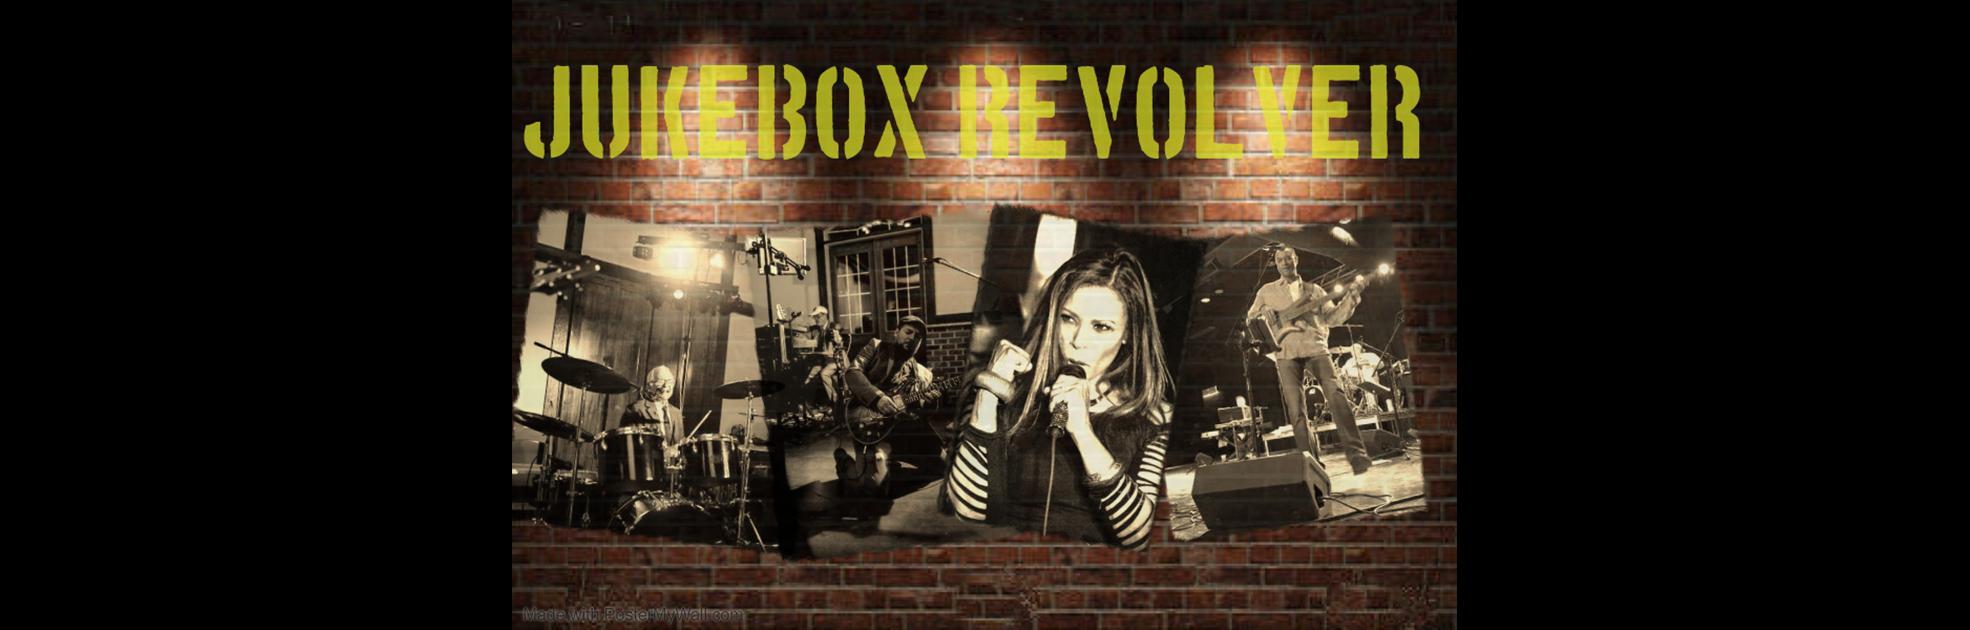 Image of JUKEBOX REVOLVER